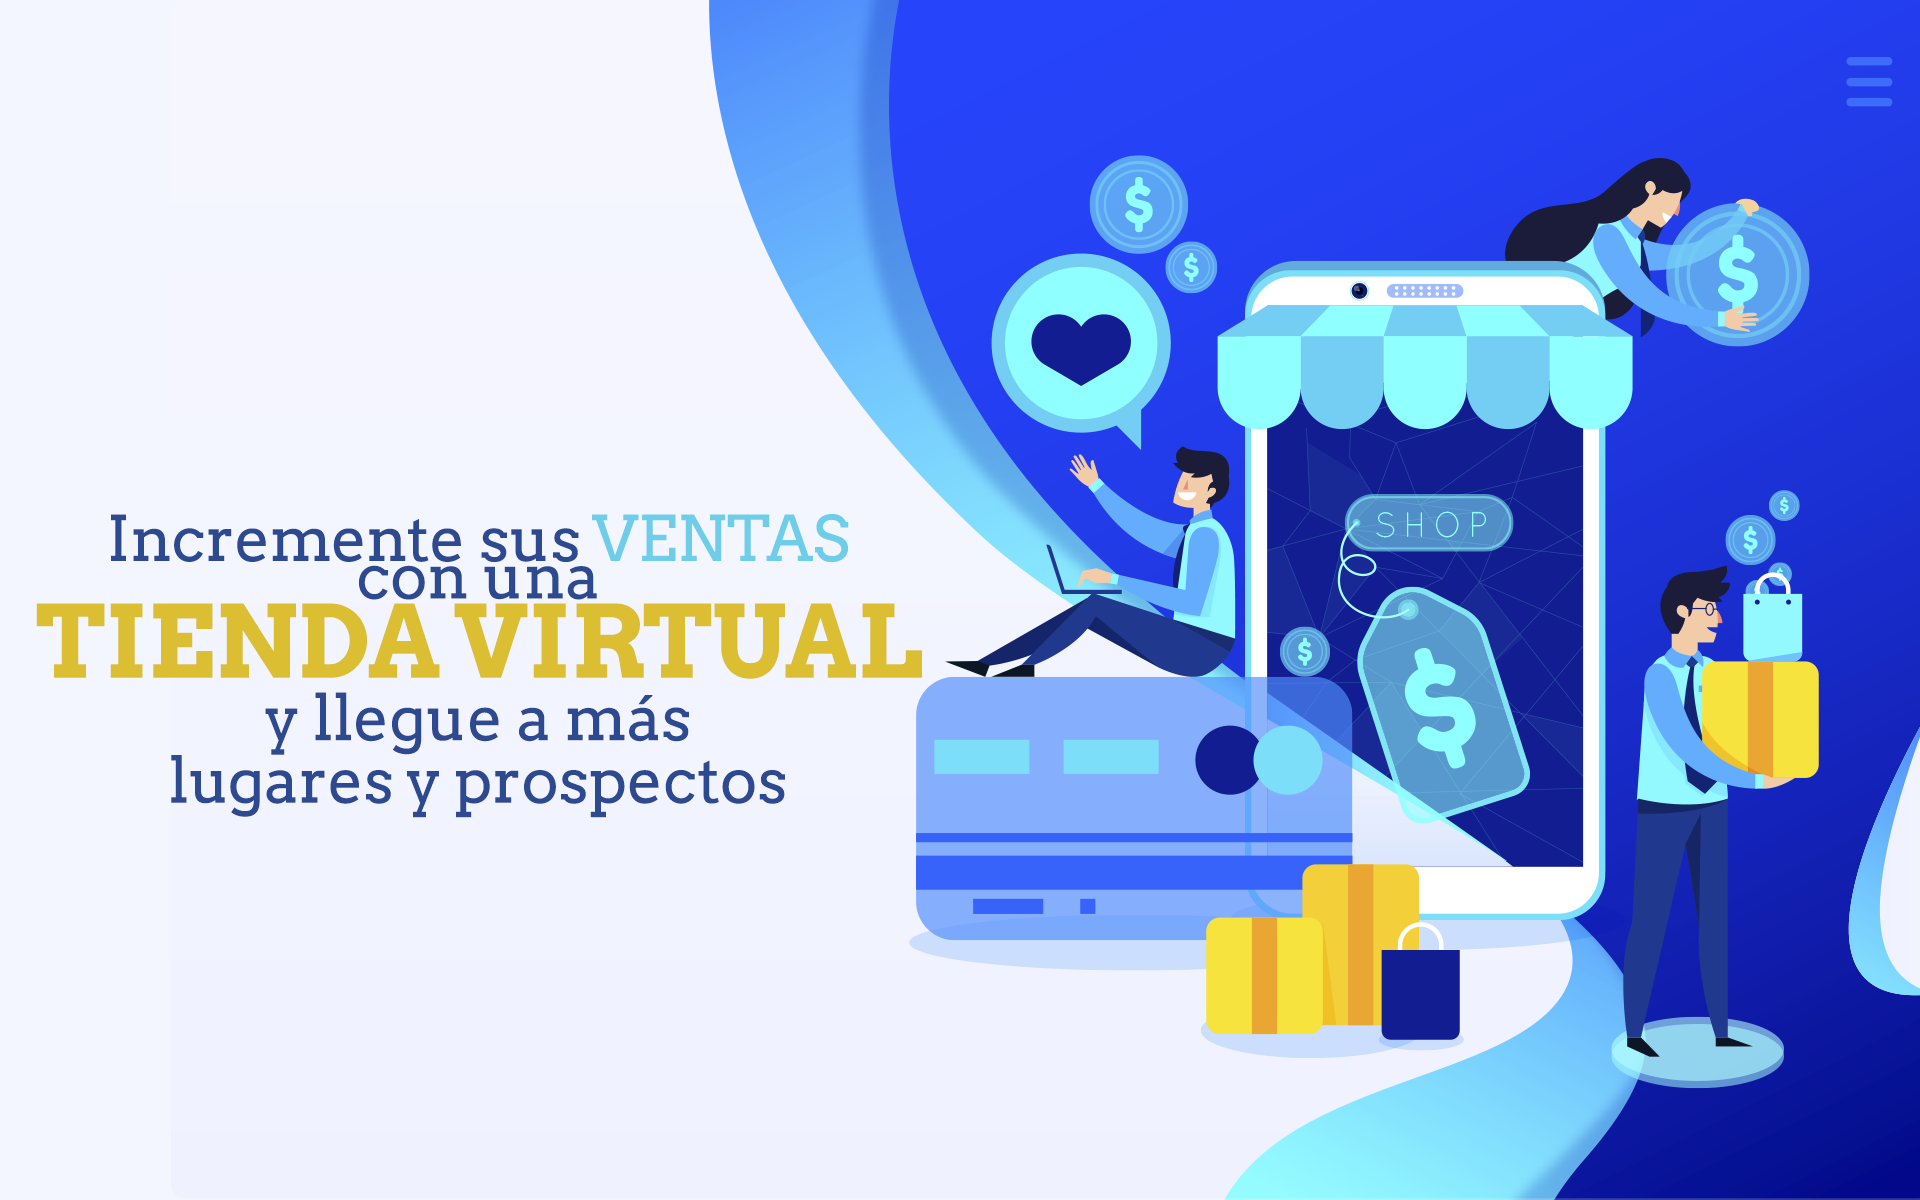 tienda virtual - internet live